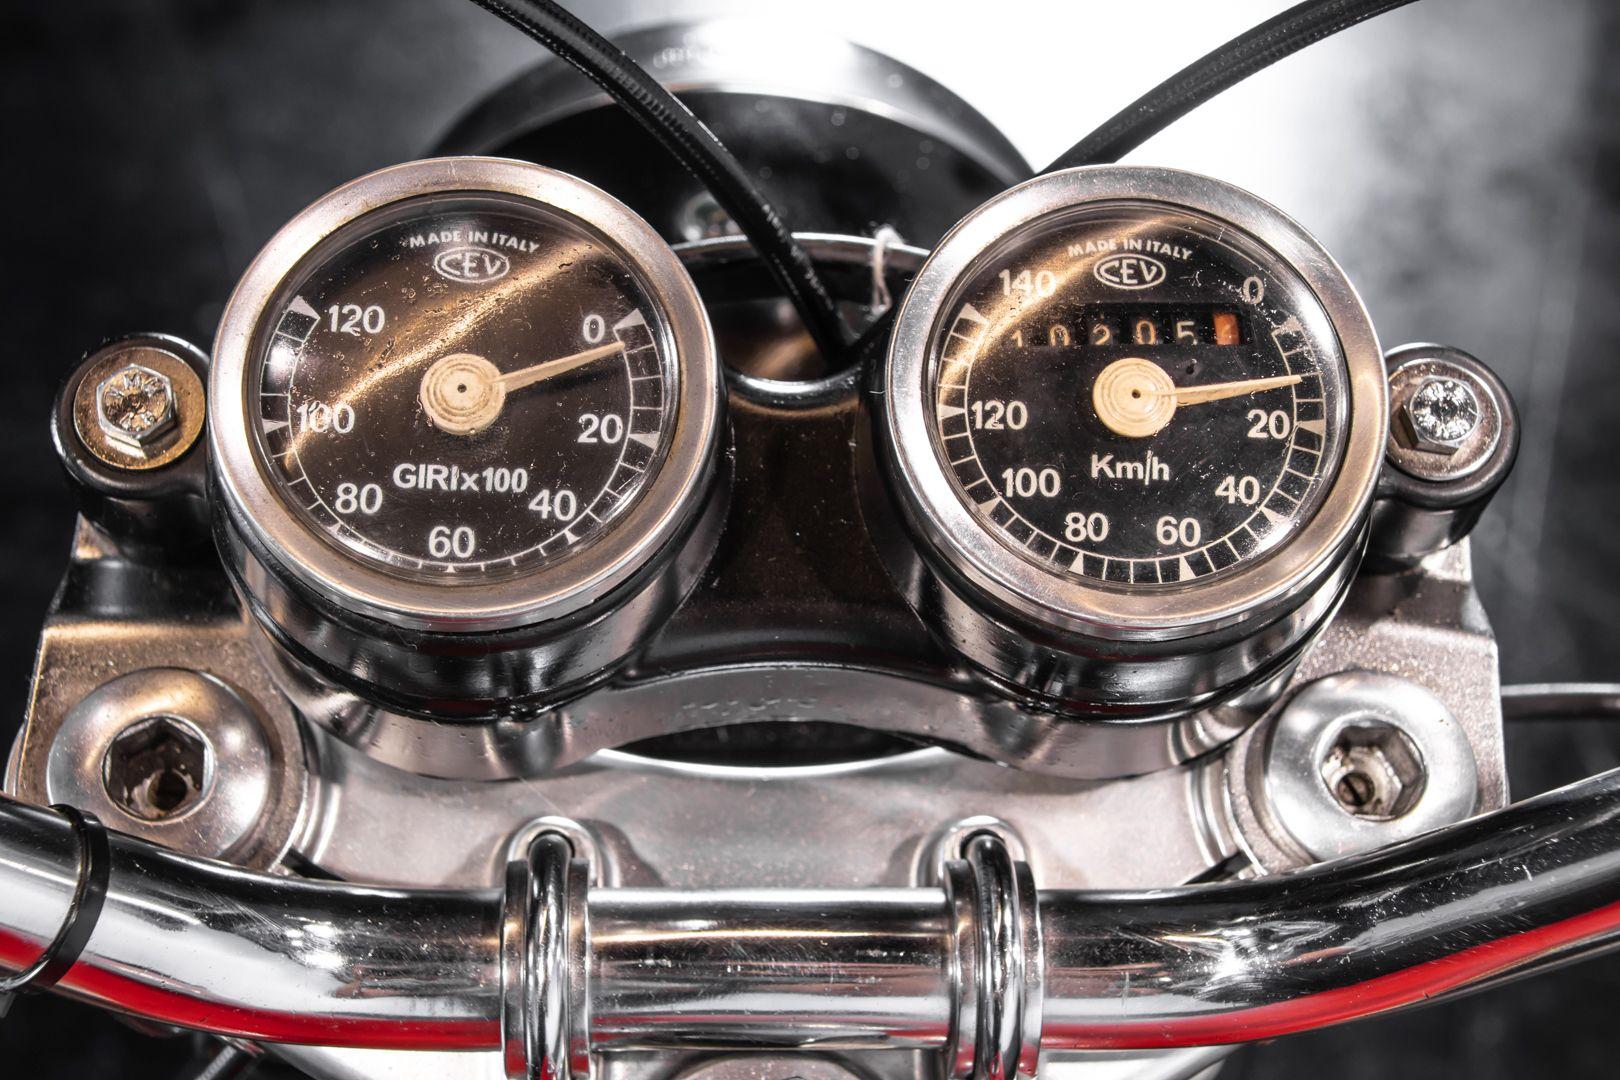 1971 Moto Morini Corsaro SS 150 77730